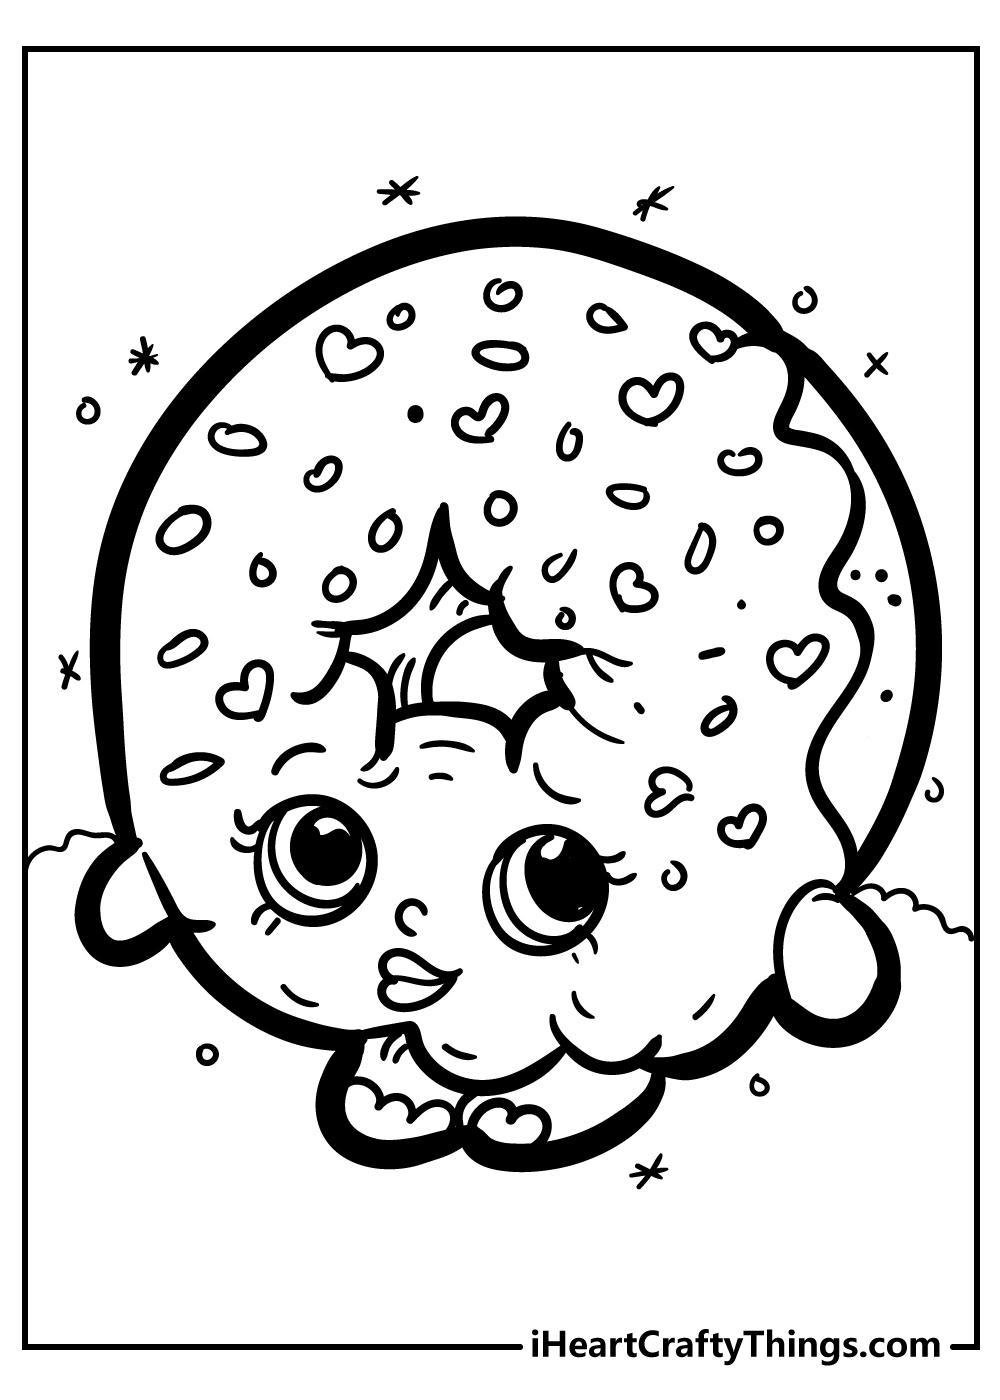 D'lish Donut shopkins coloring book free printable